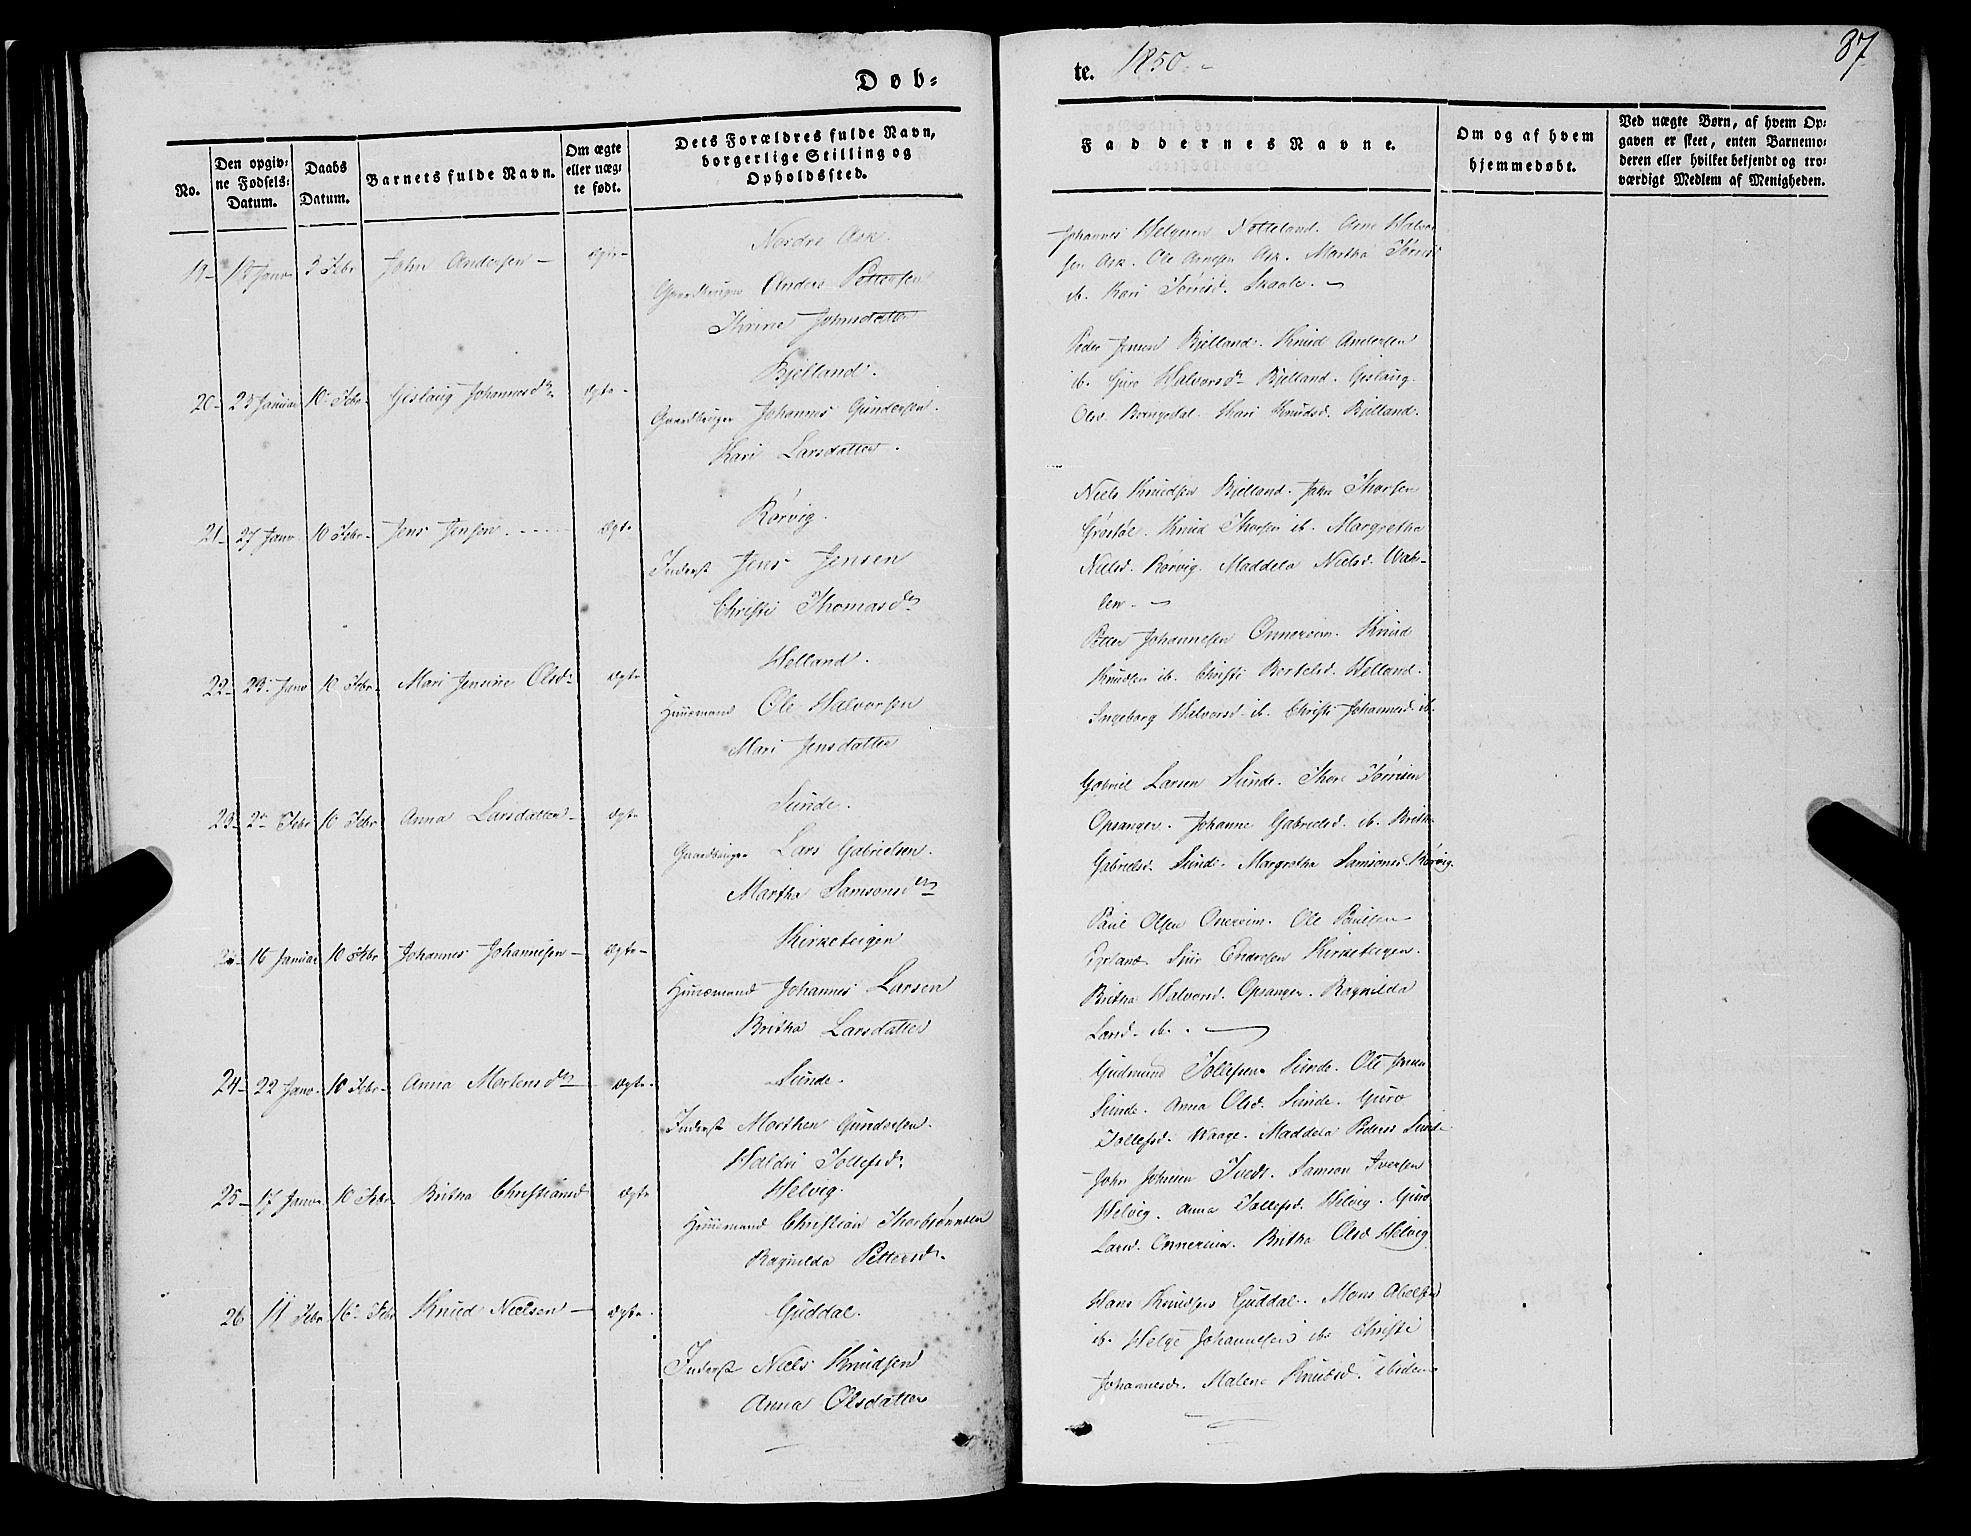 SAB, Kvinnherad Sokneprestembete, H/Haa: Ministerialbok nr. A 7, 1843-1853, s. 87